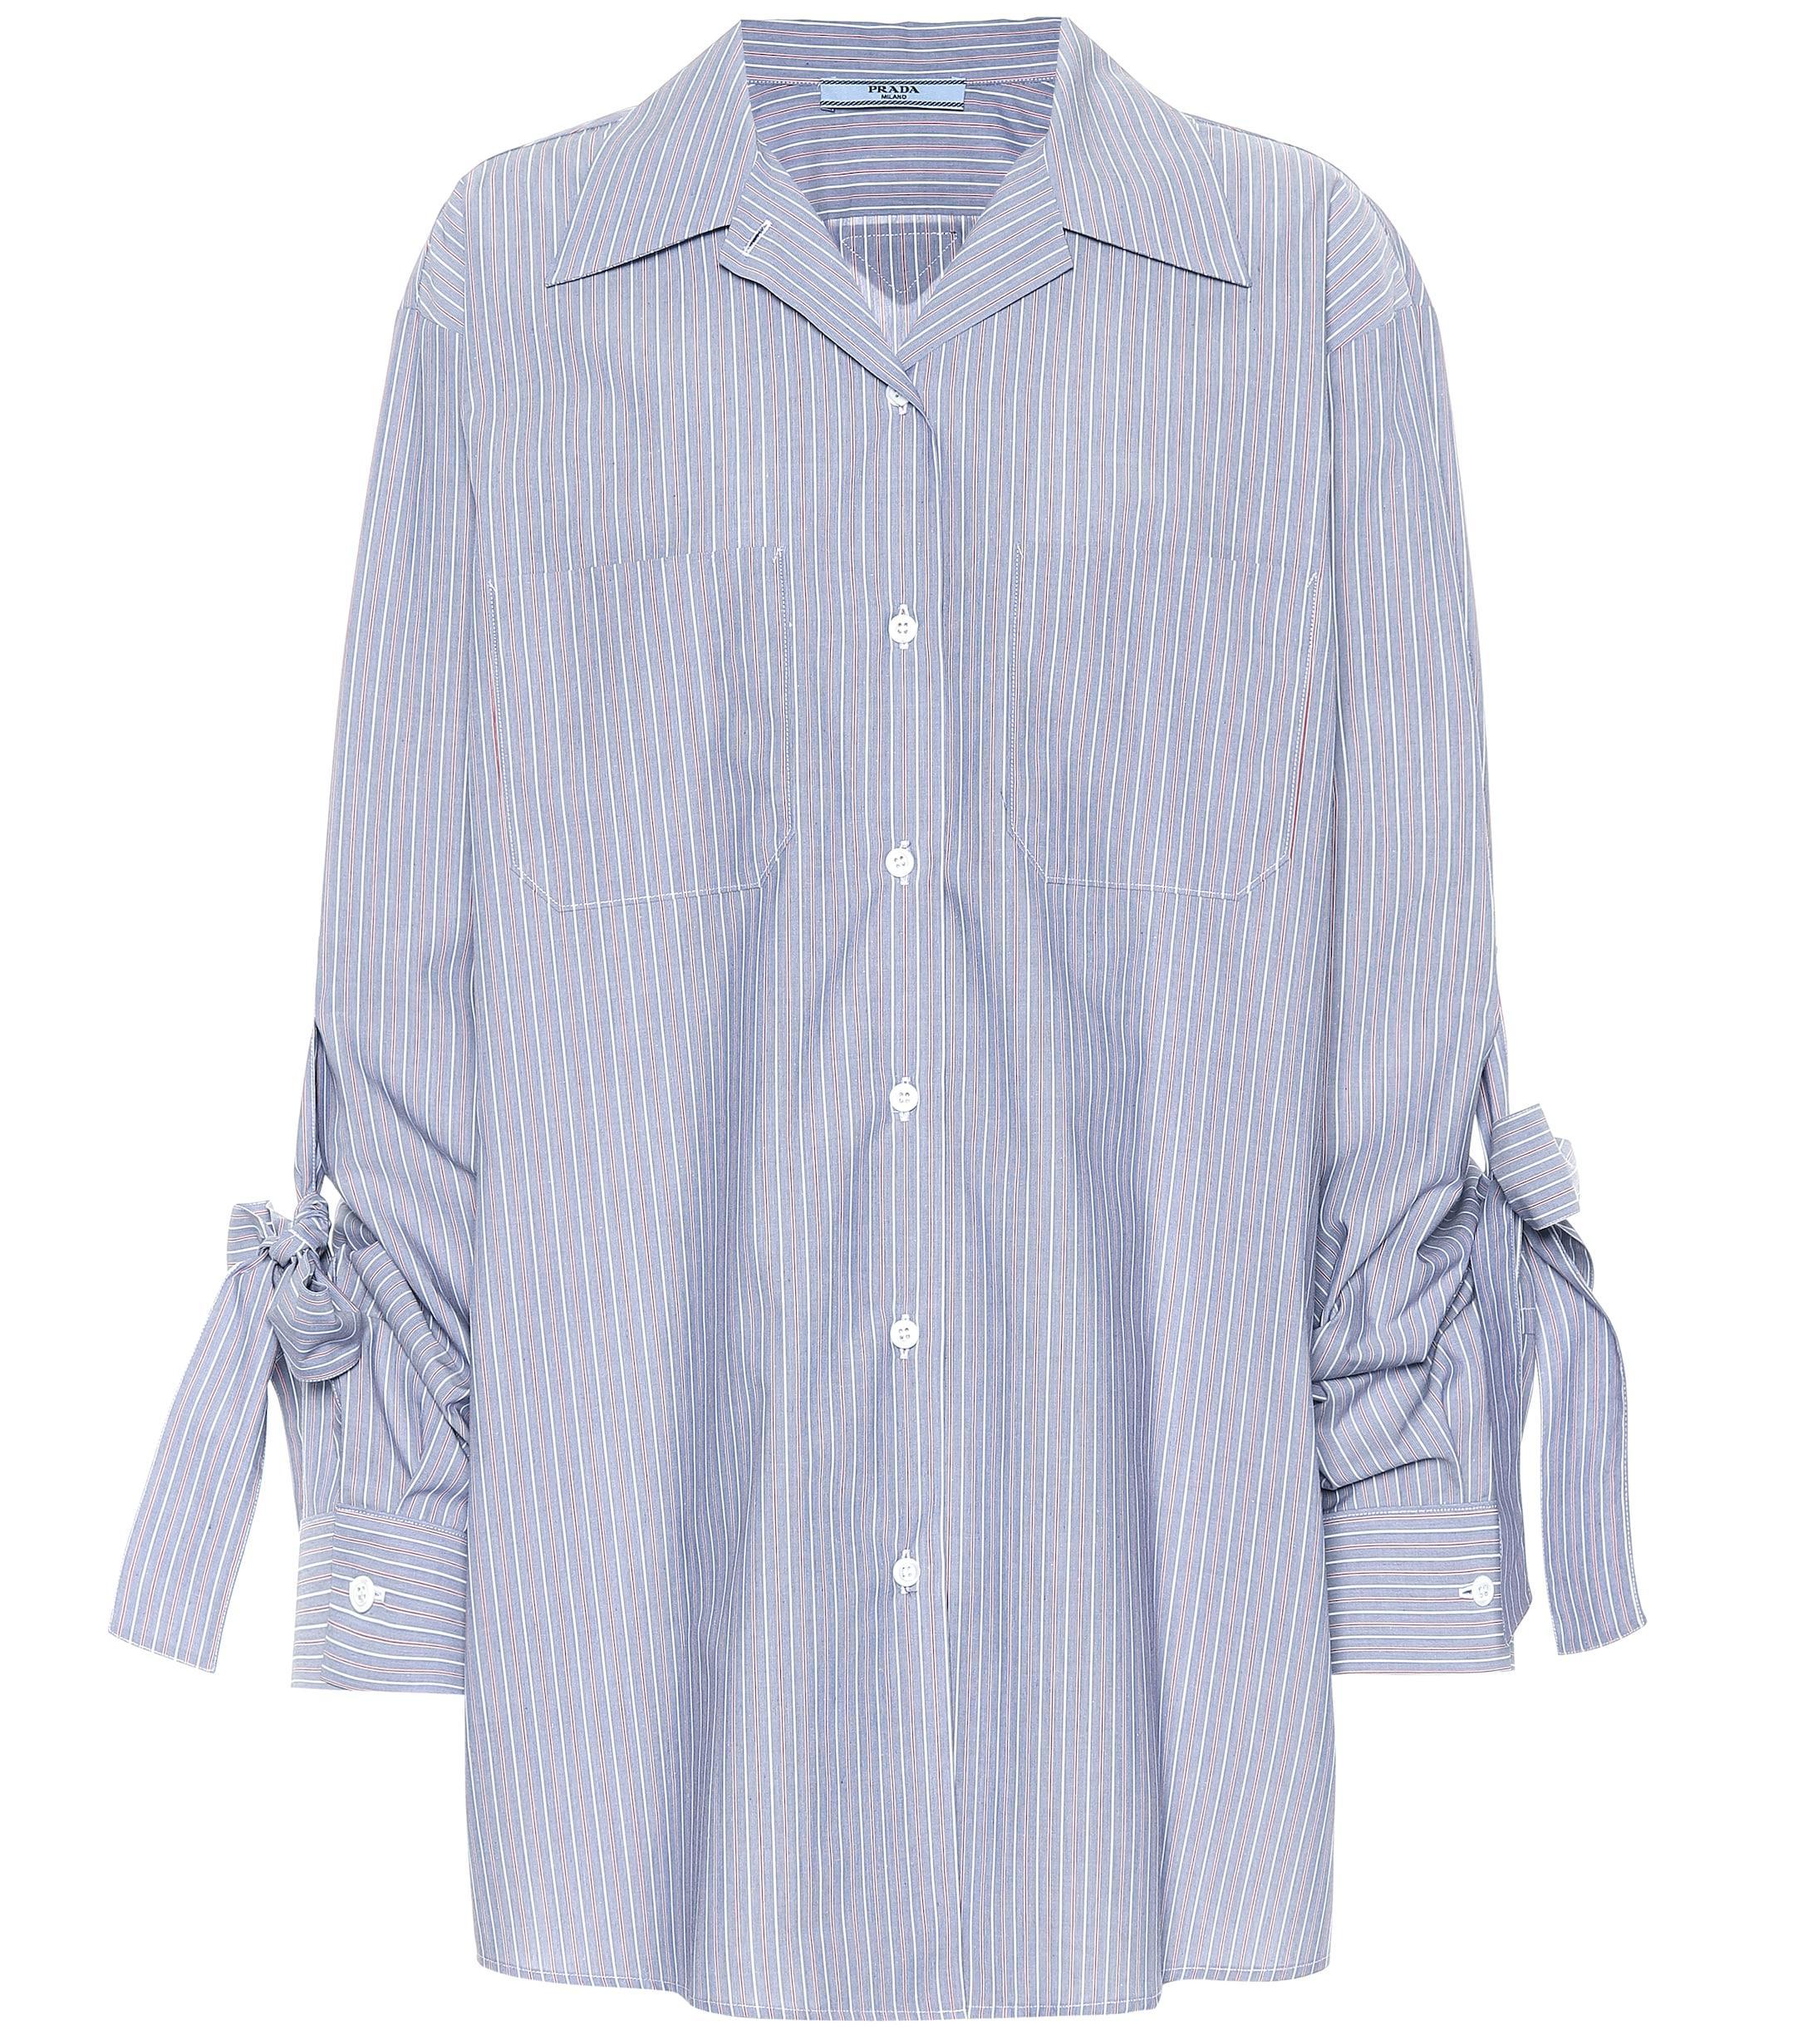 b7ef0e79c971c Lyst - Prada Striped Cotton Shirt in Blue